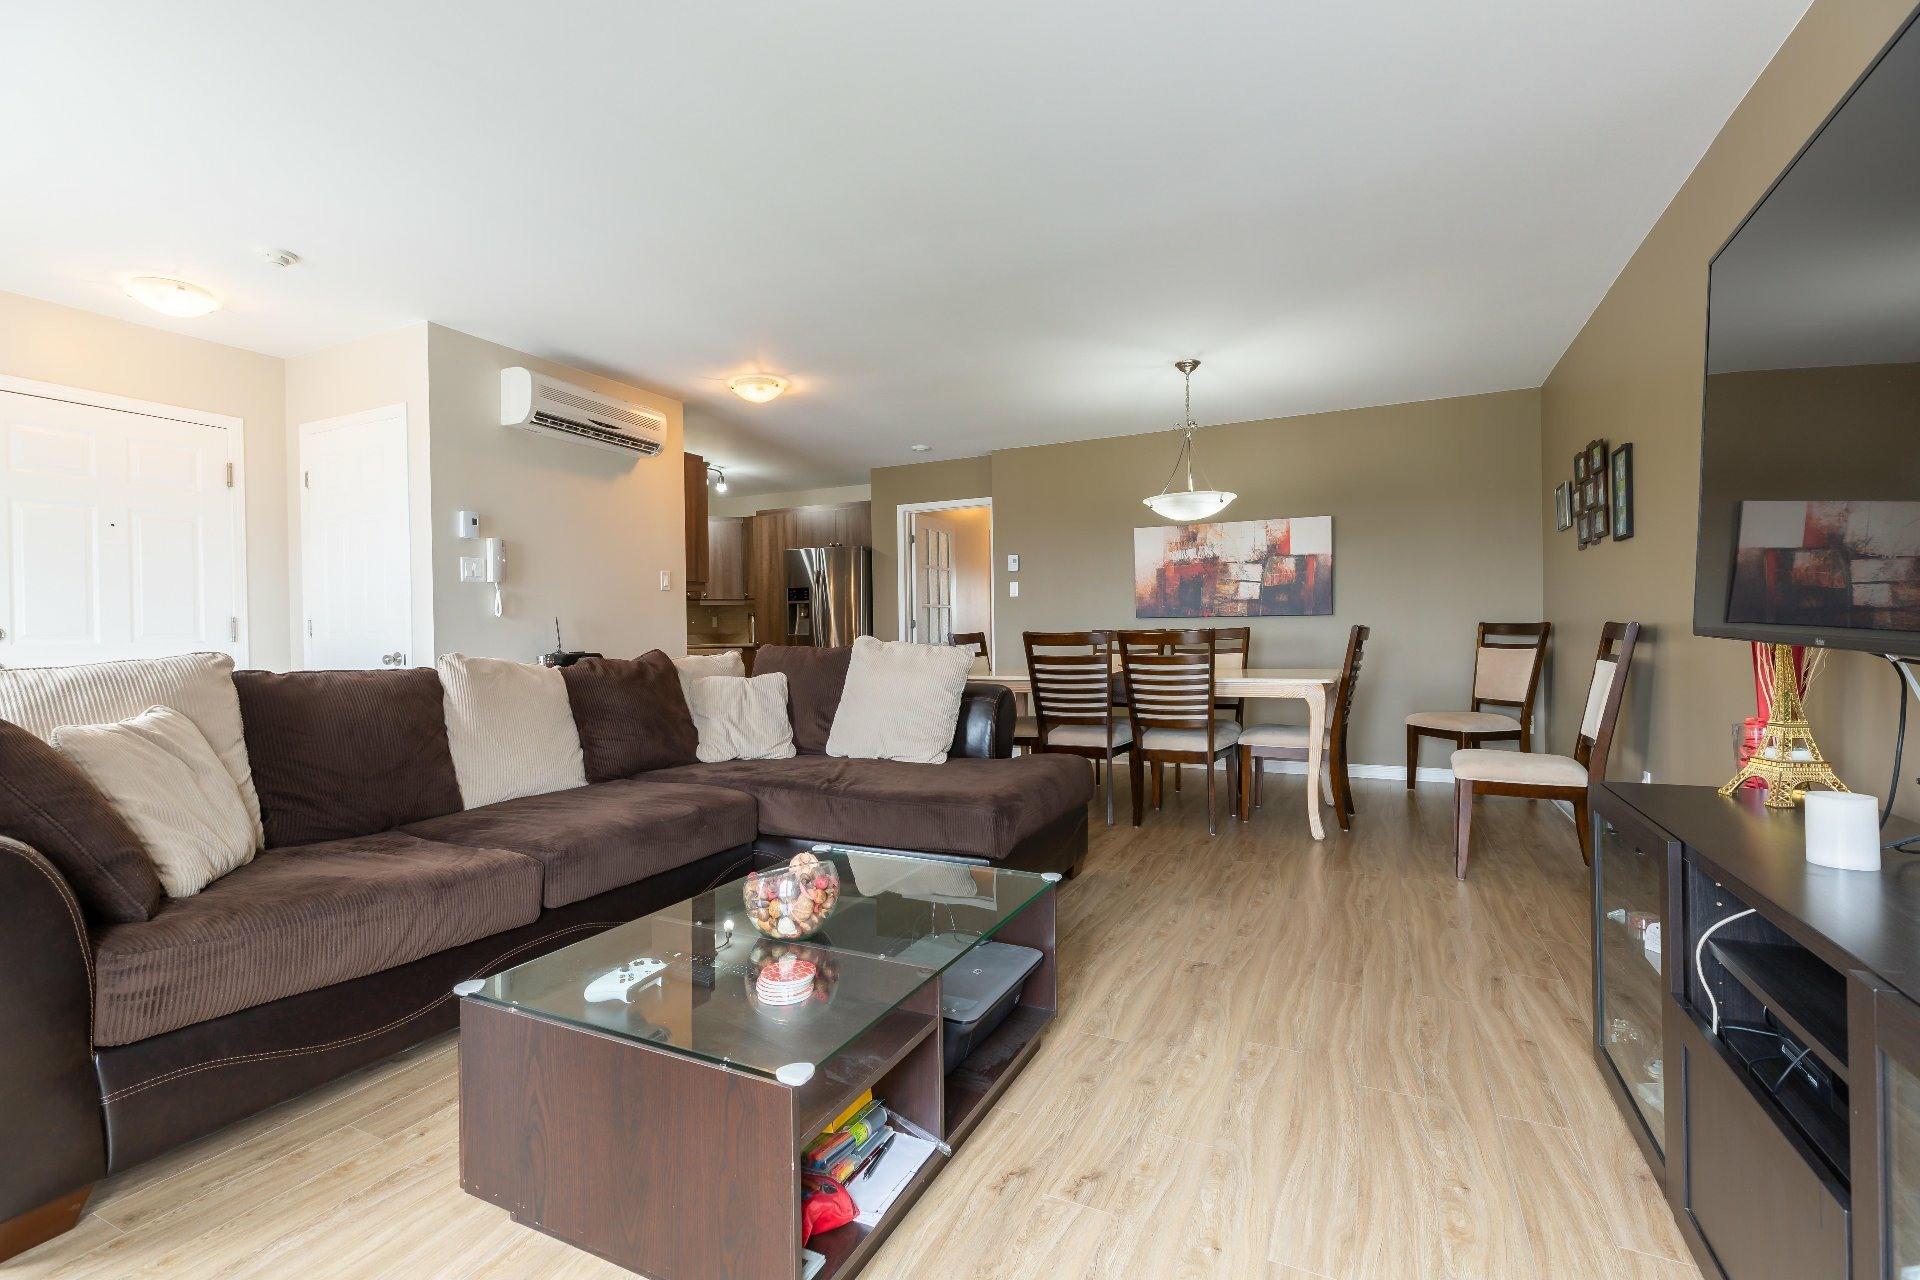 image 5 - Apartment For sale Vaudreuil-Dorion - 9 rooms